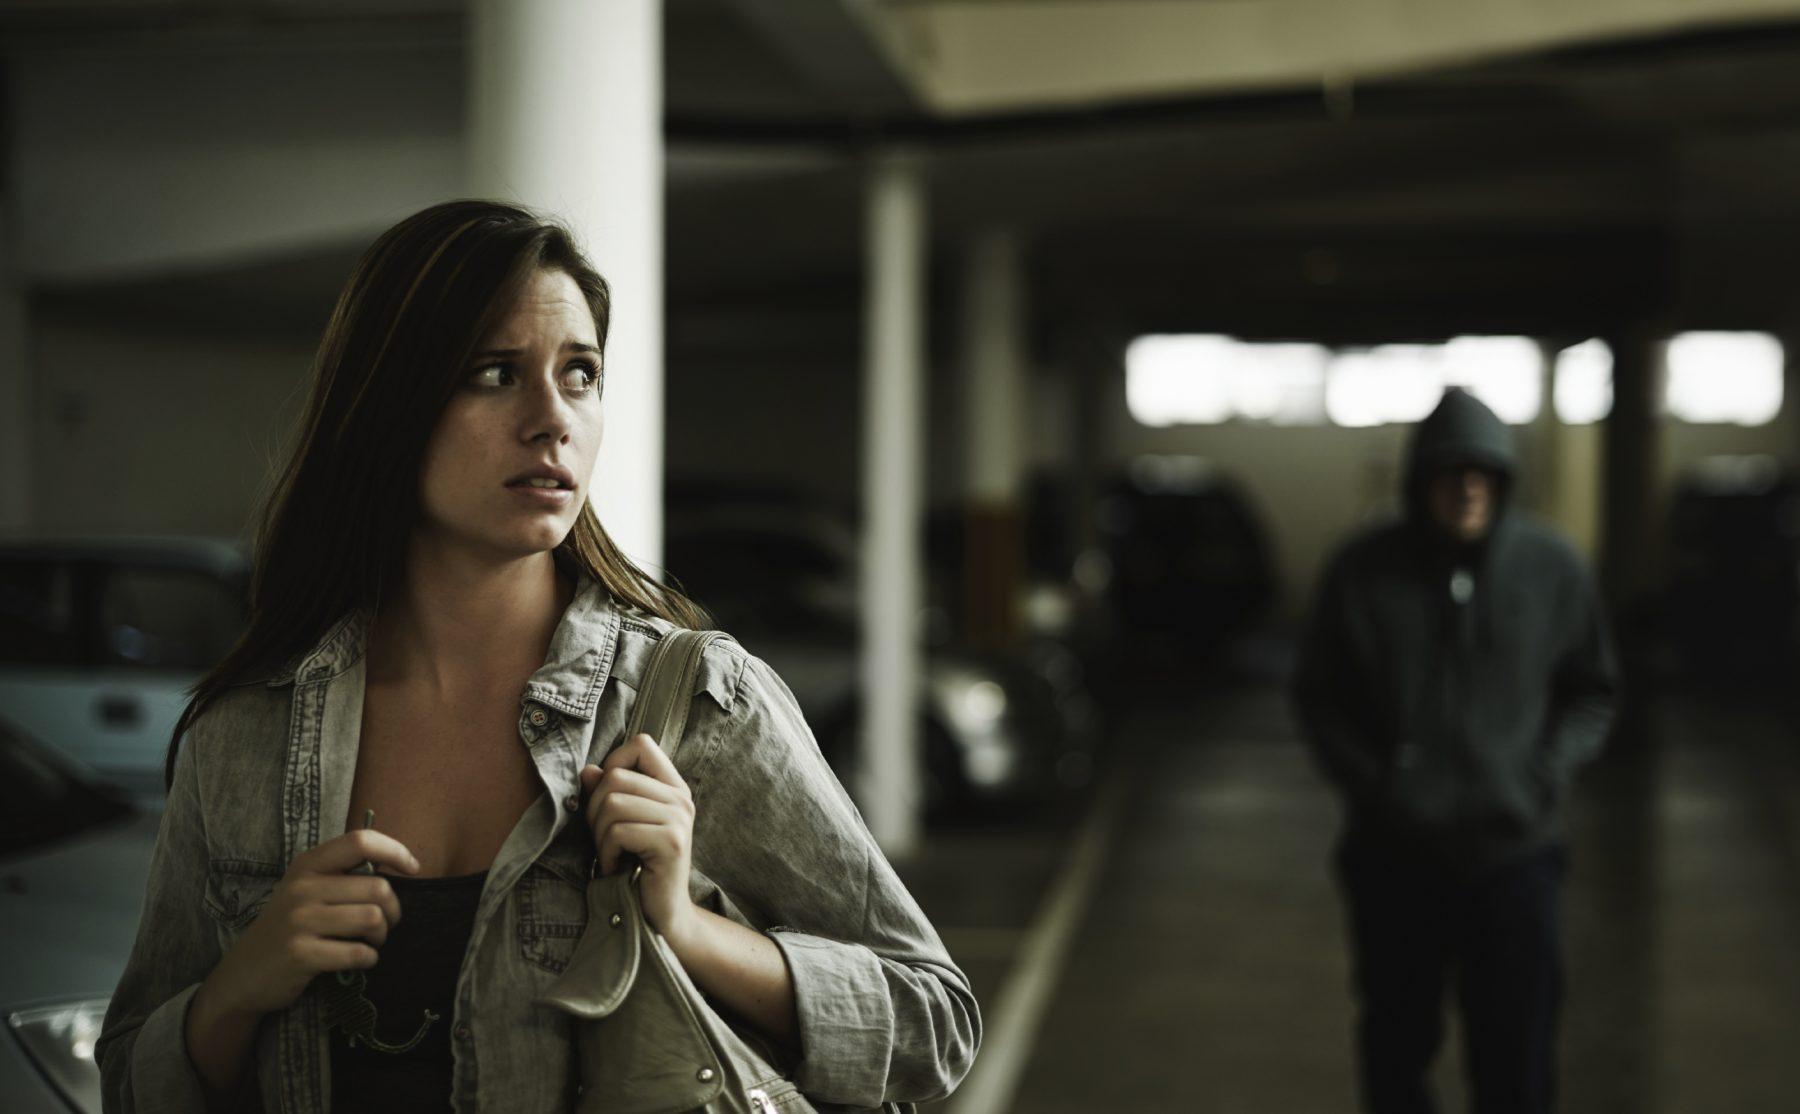 OPSEC: Combating Violence – Social Media Lag Posting